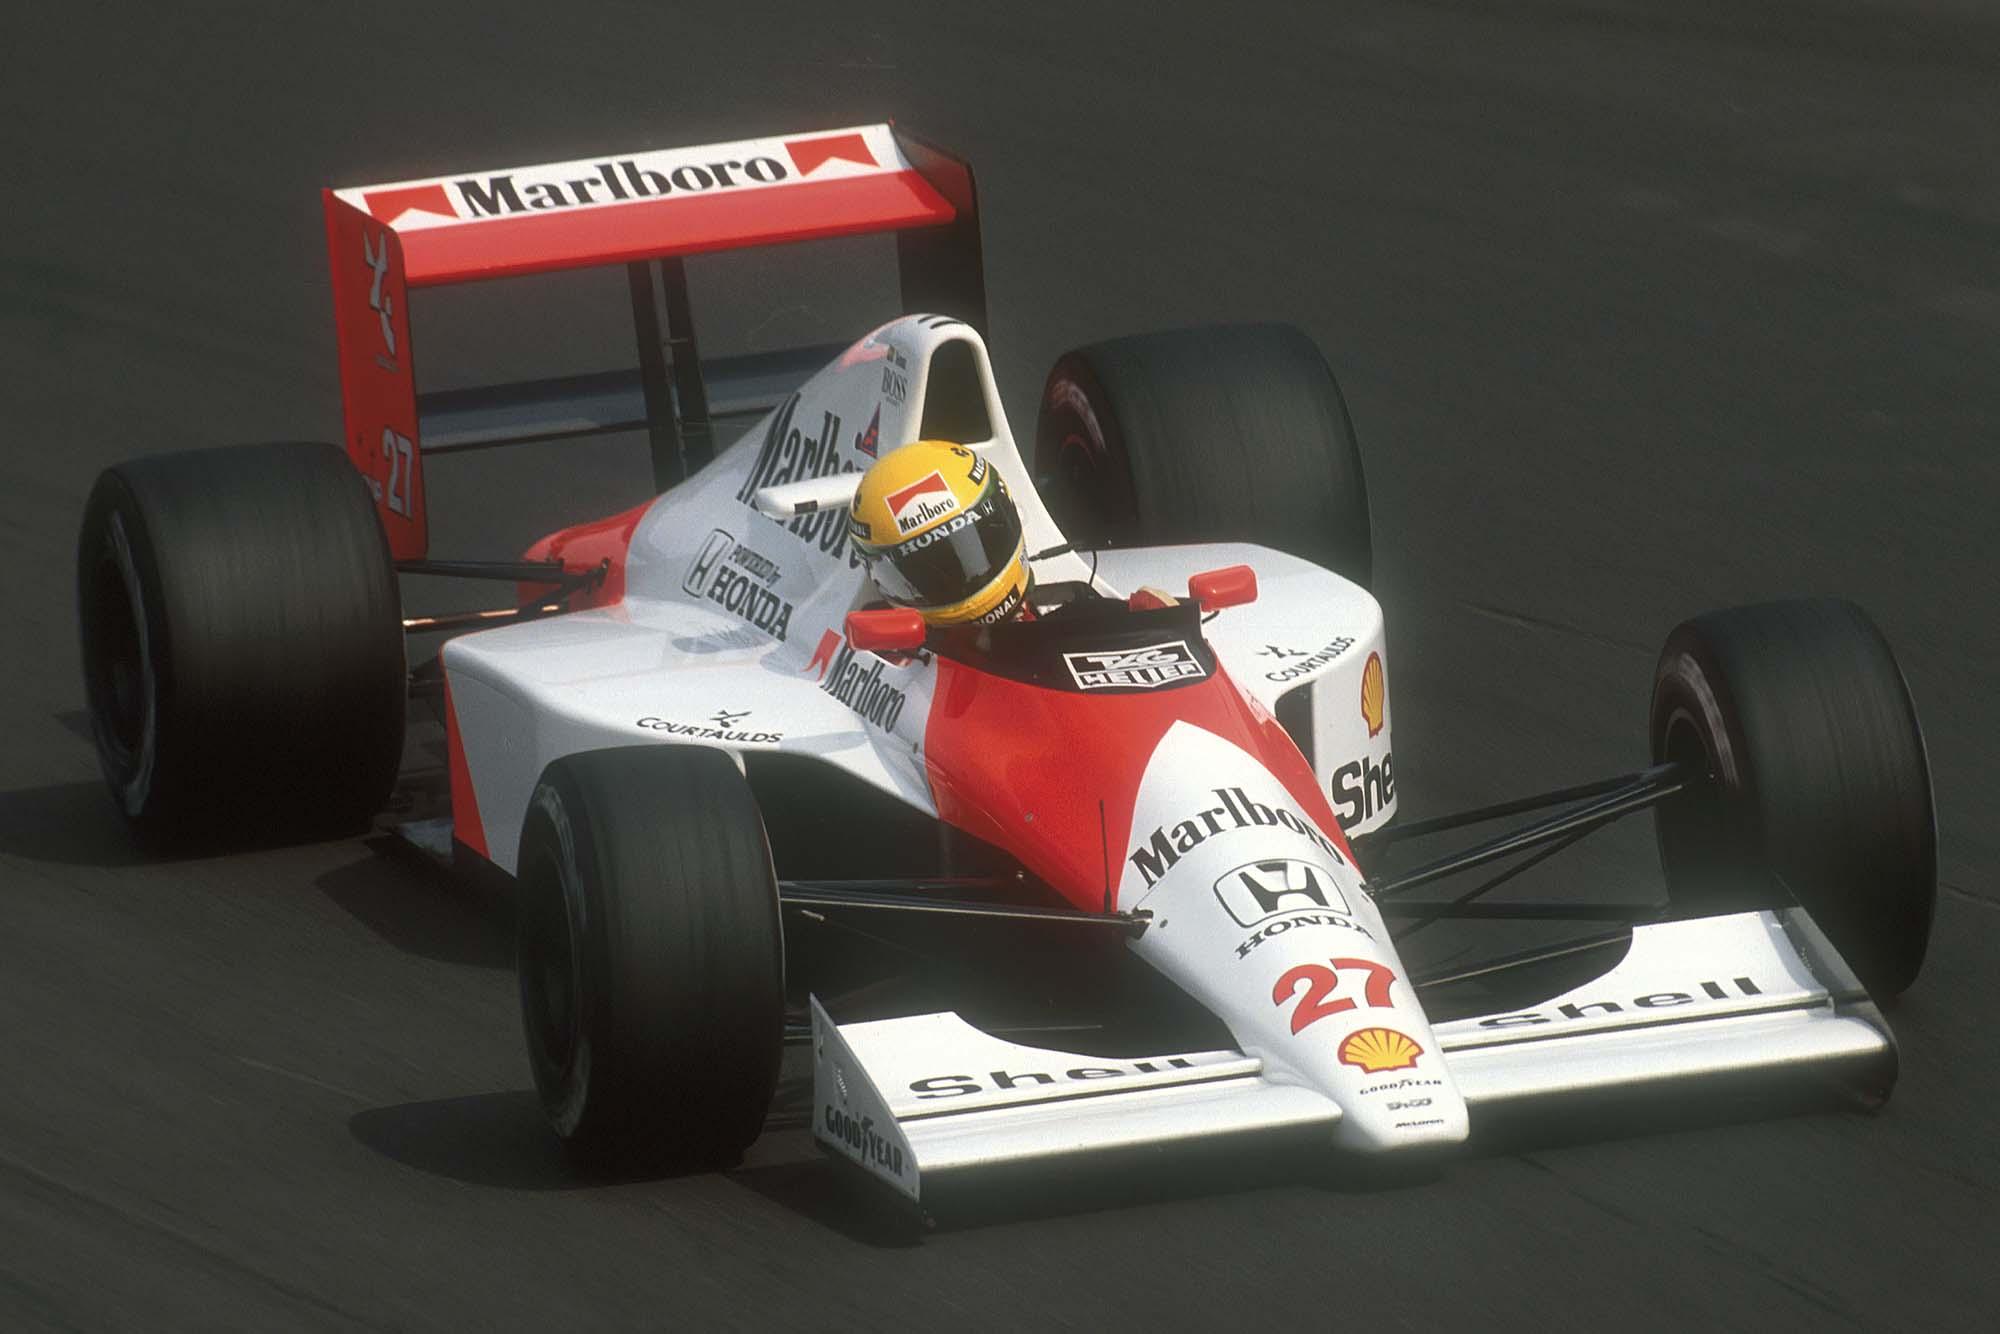 Ayrton Senna in his McLaren-Honda at the 1990 Italian Grand Prix Monza